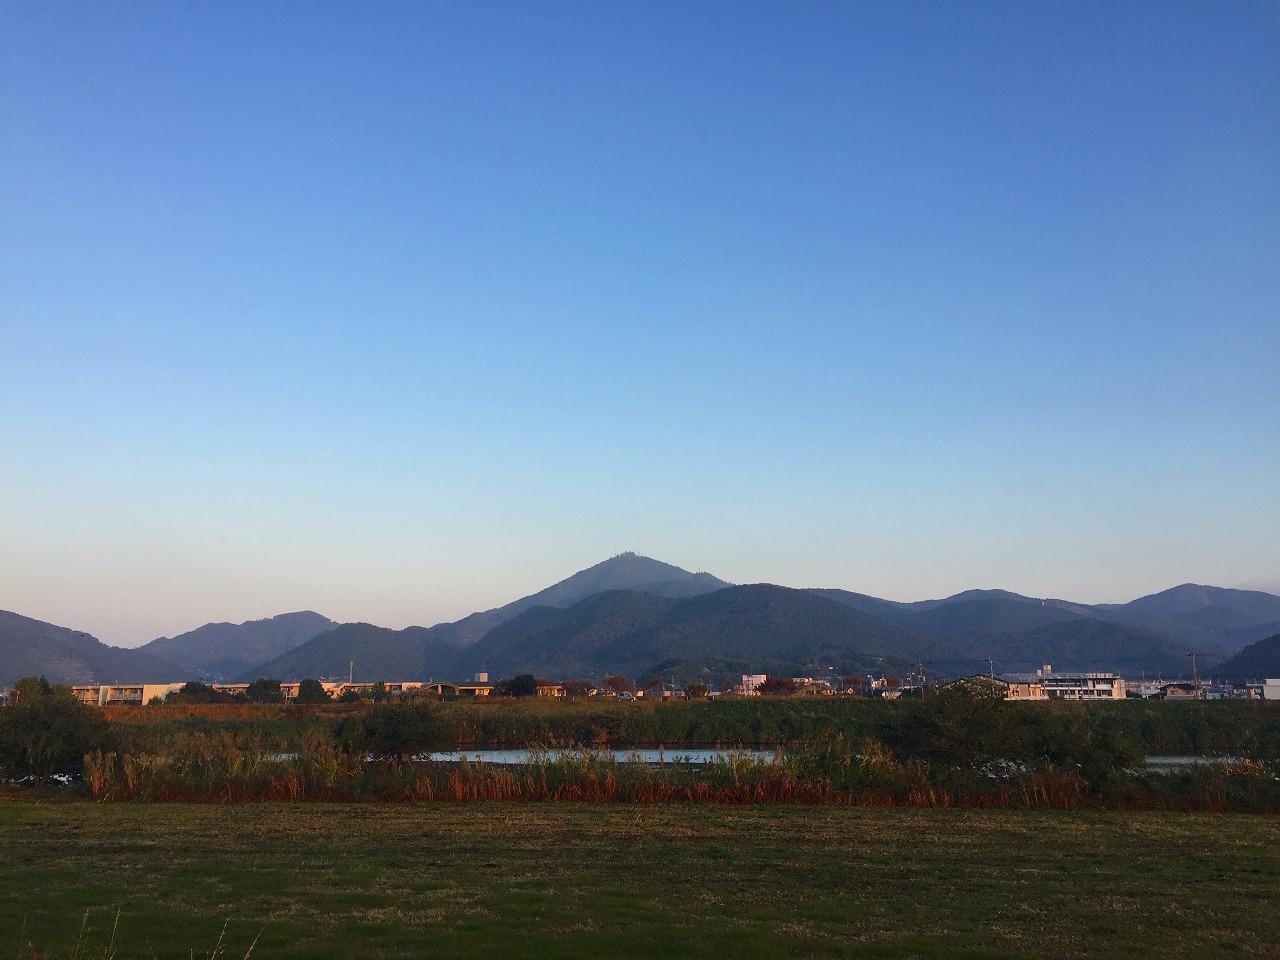 今朝の金峰山 2016.11.9